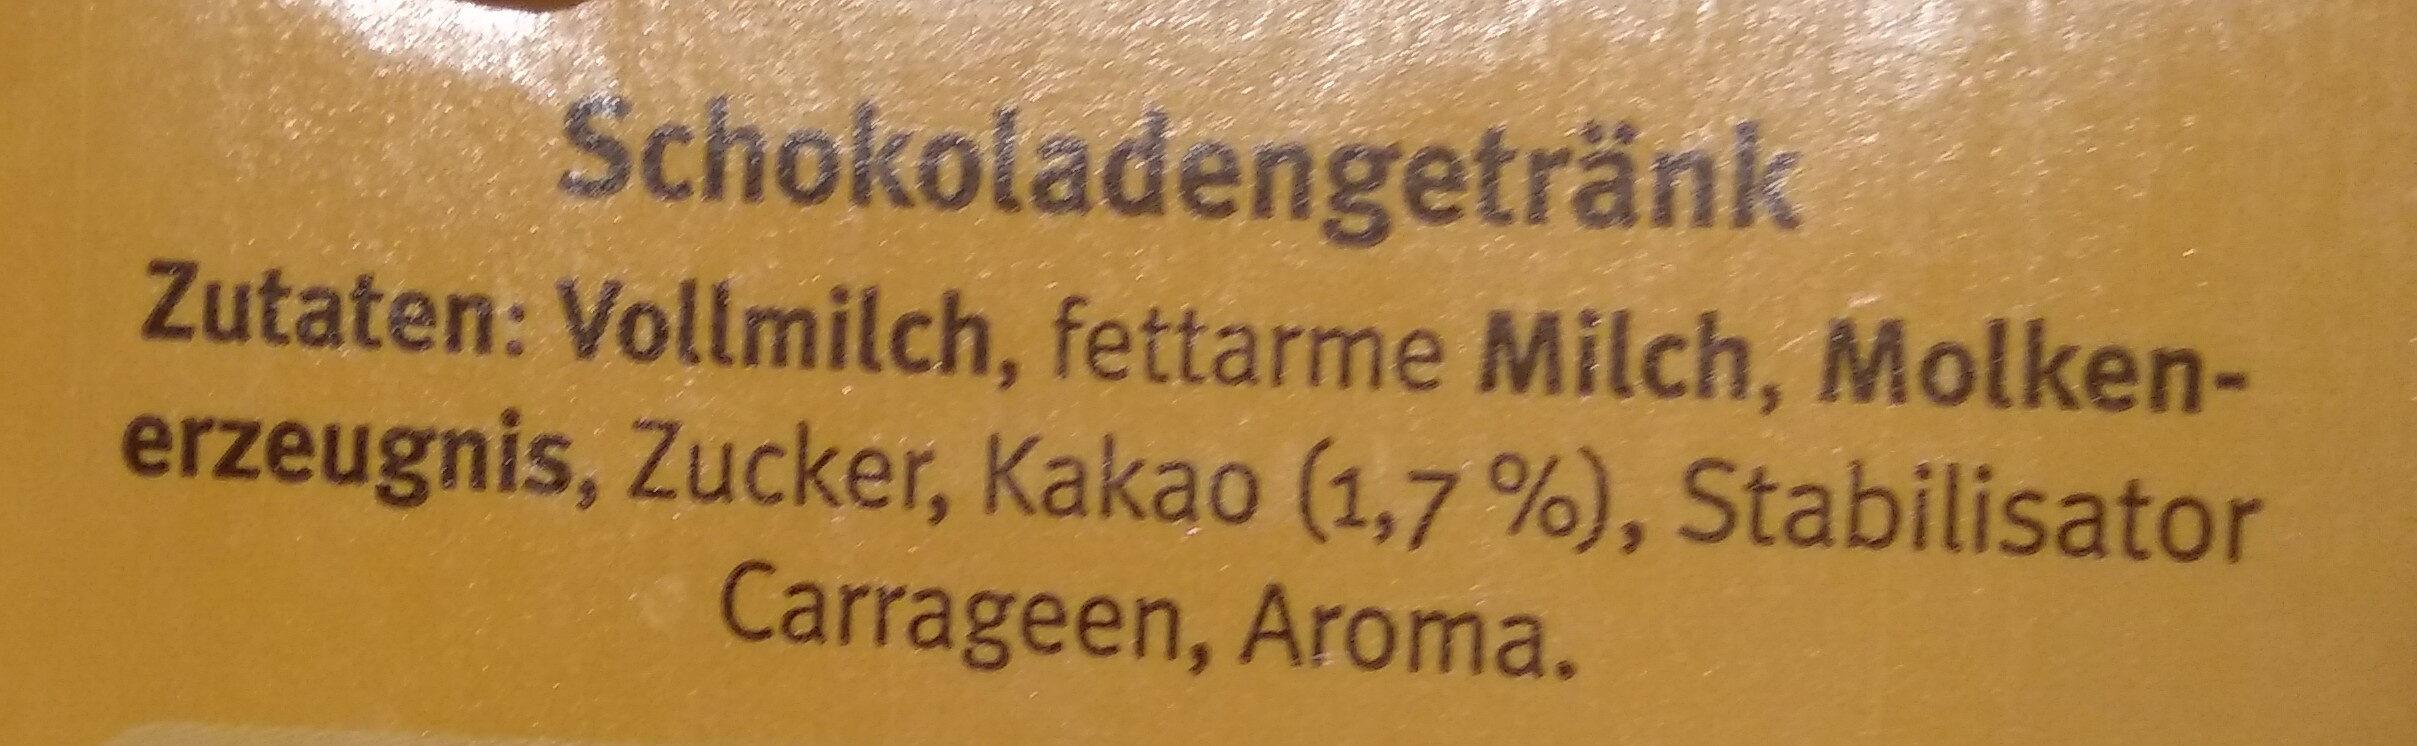 Chocomel - Zutaten - de